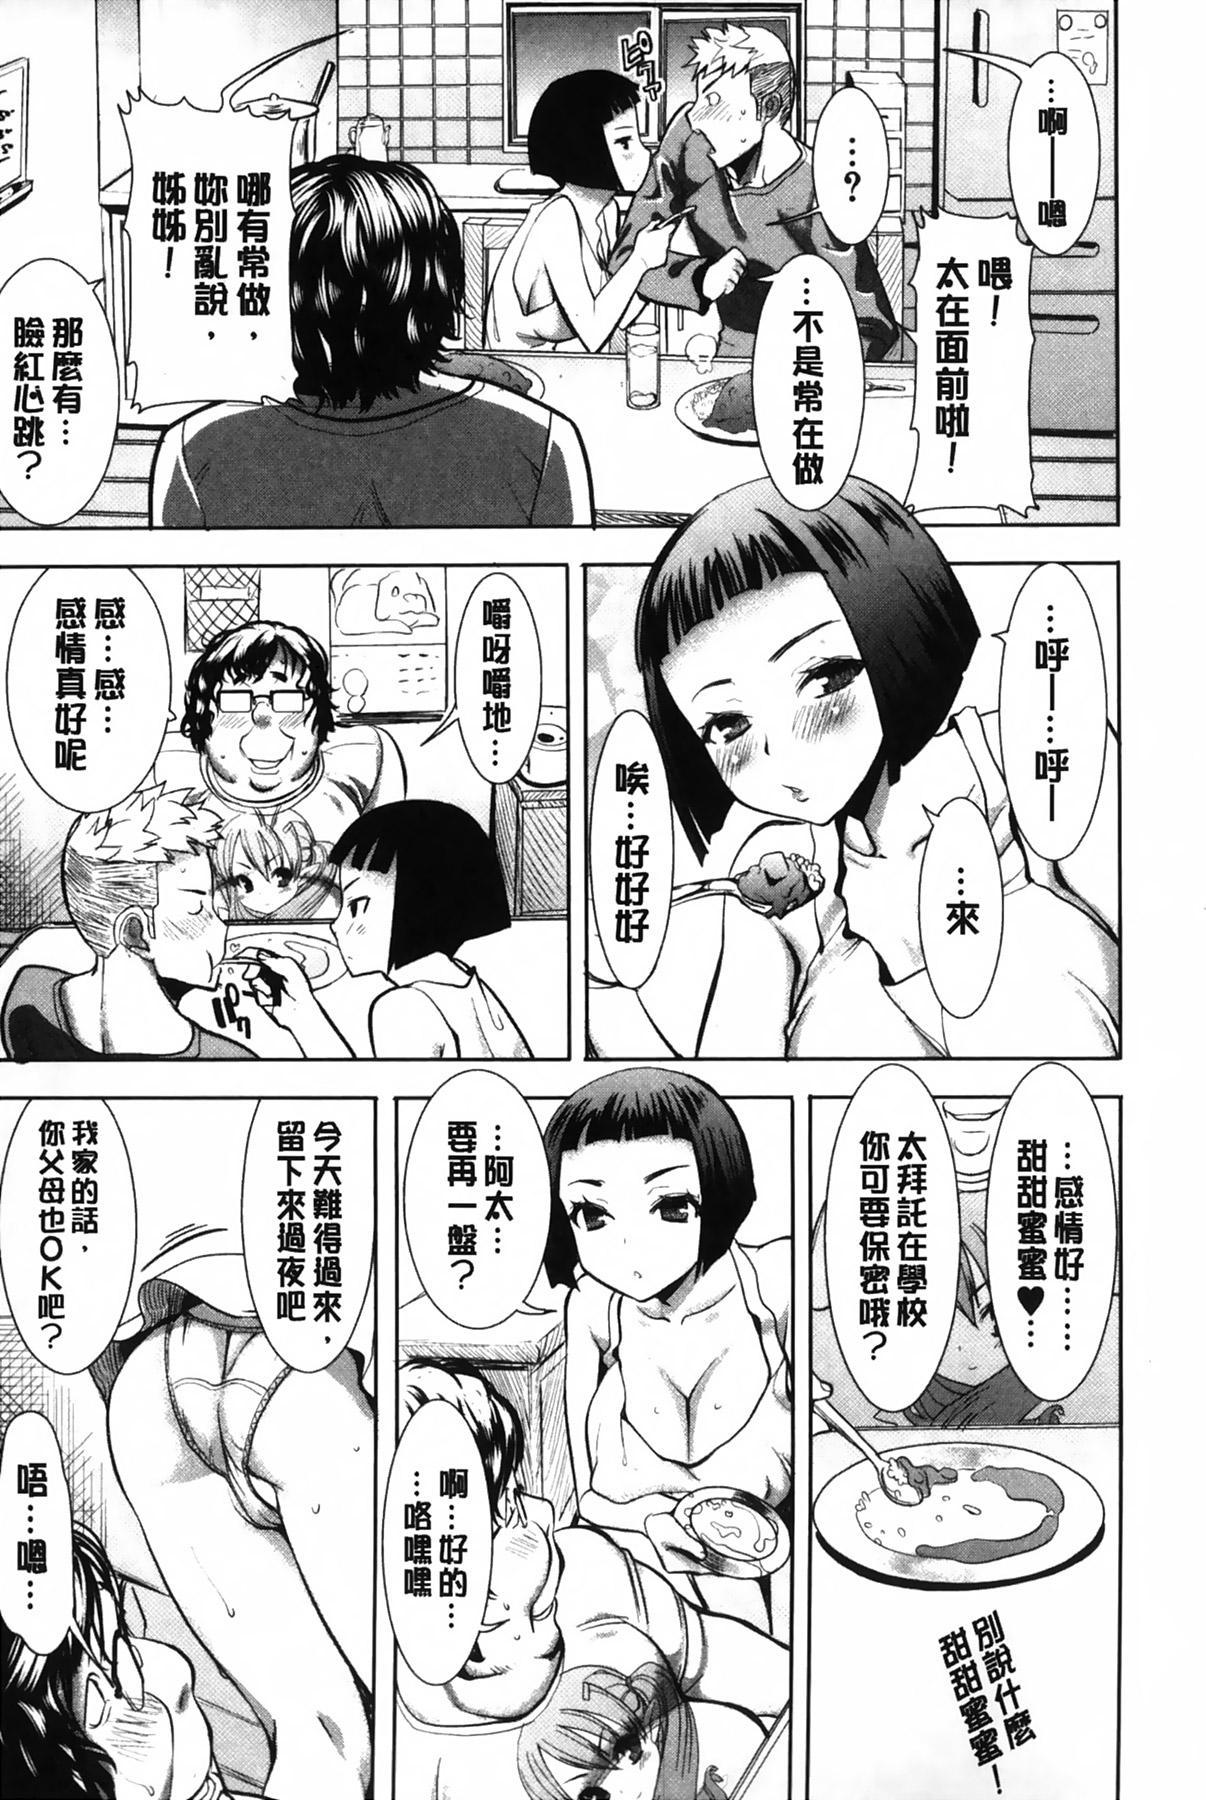 Ane Unsweet - Mihiragi Hiyori + | 姊姊不甜美 彌平木日和+ 7